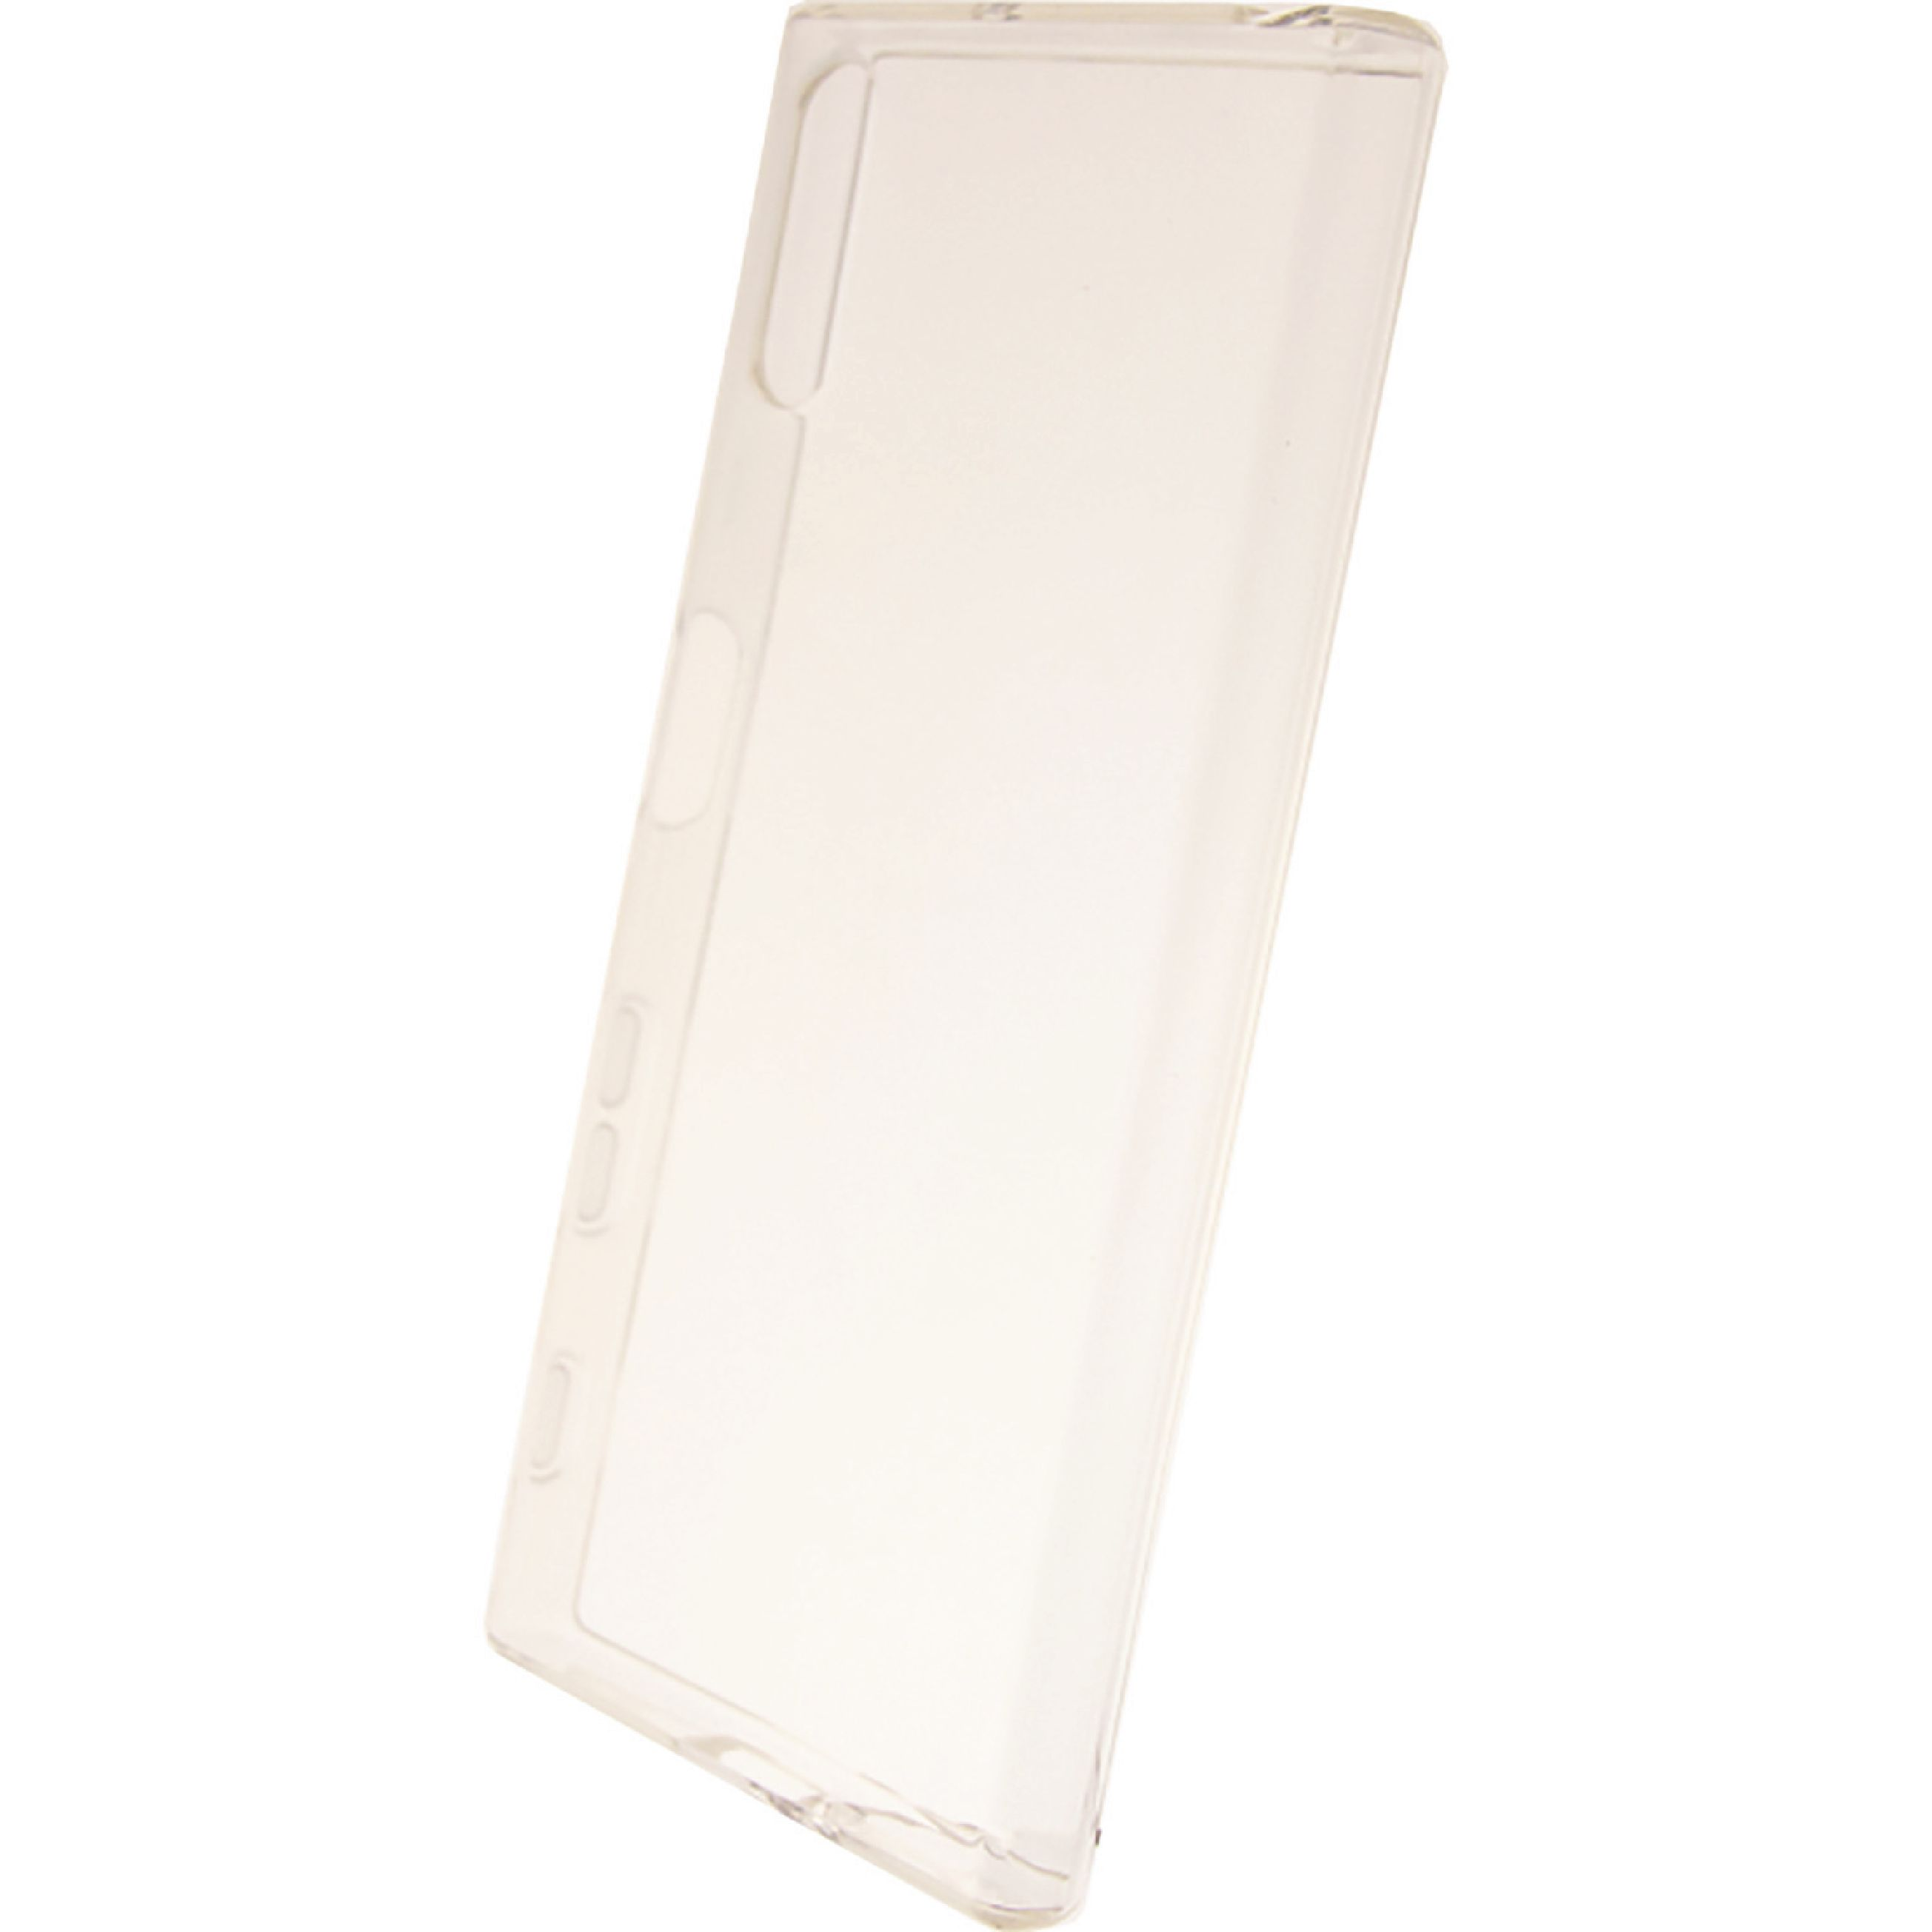 Image of   Telefon Gel-Etui Sony Xperia XZ Gennemsigtig